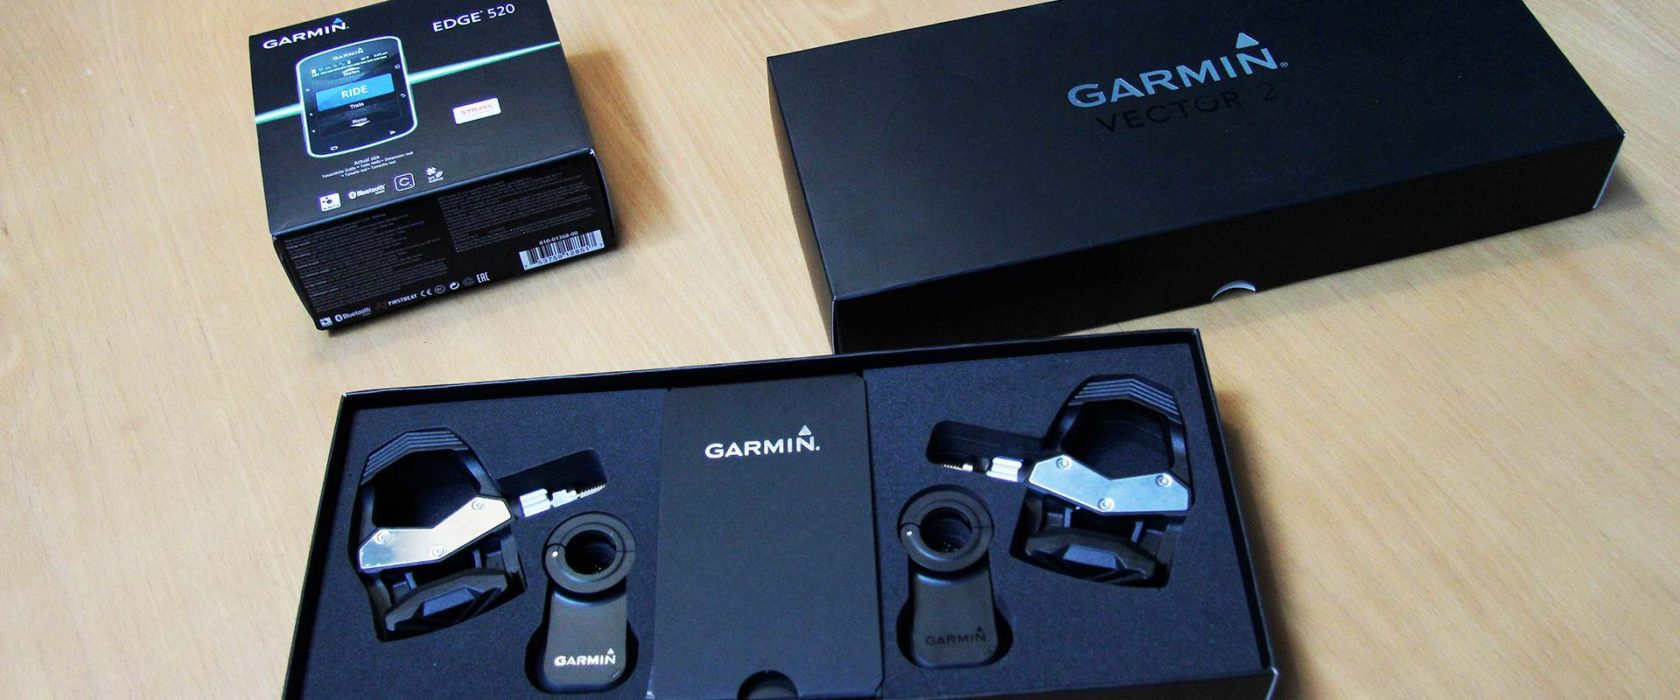 garminedge520vector2-008